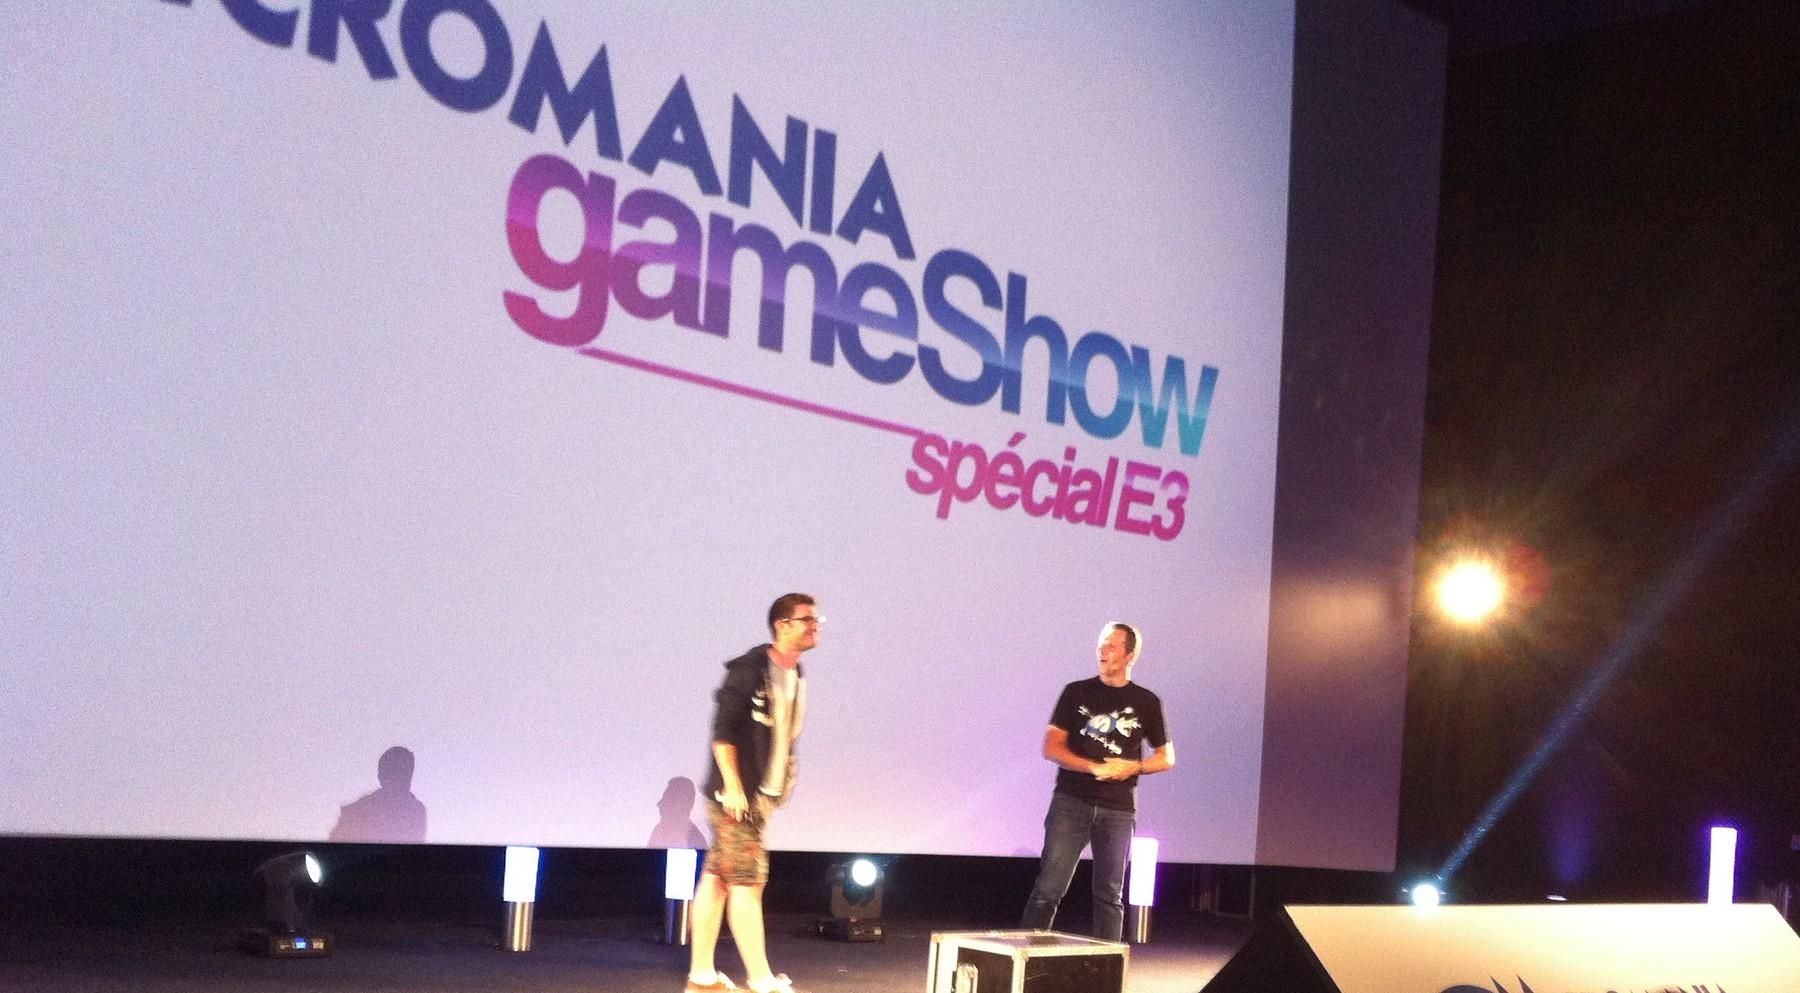 Micromania Game Show 2014